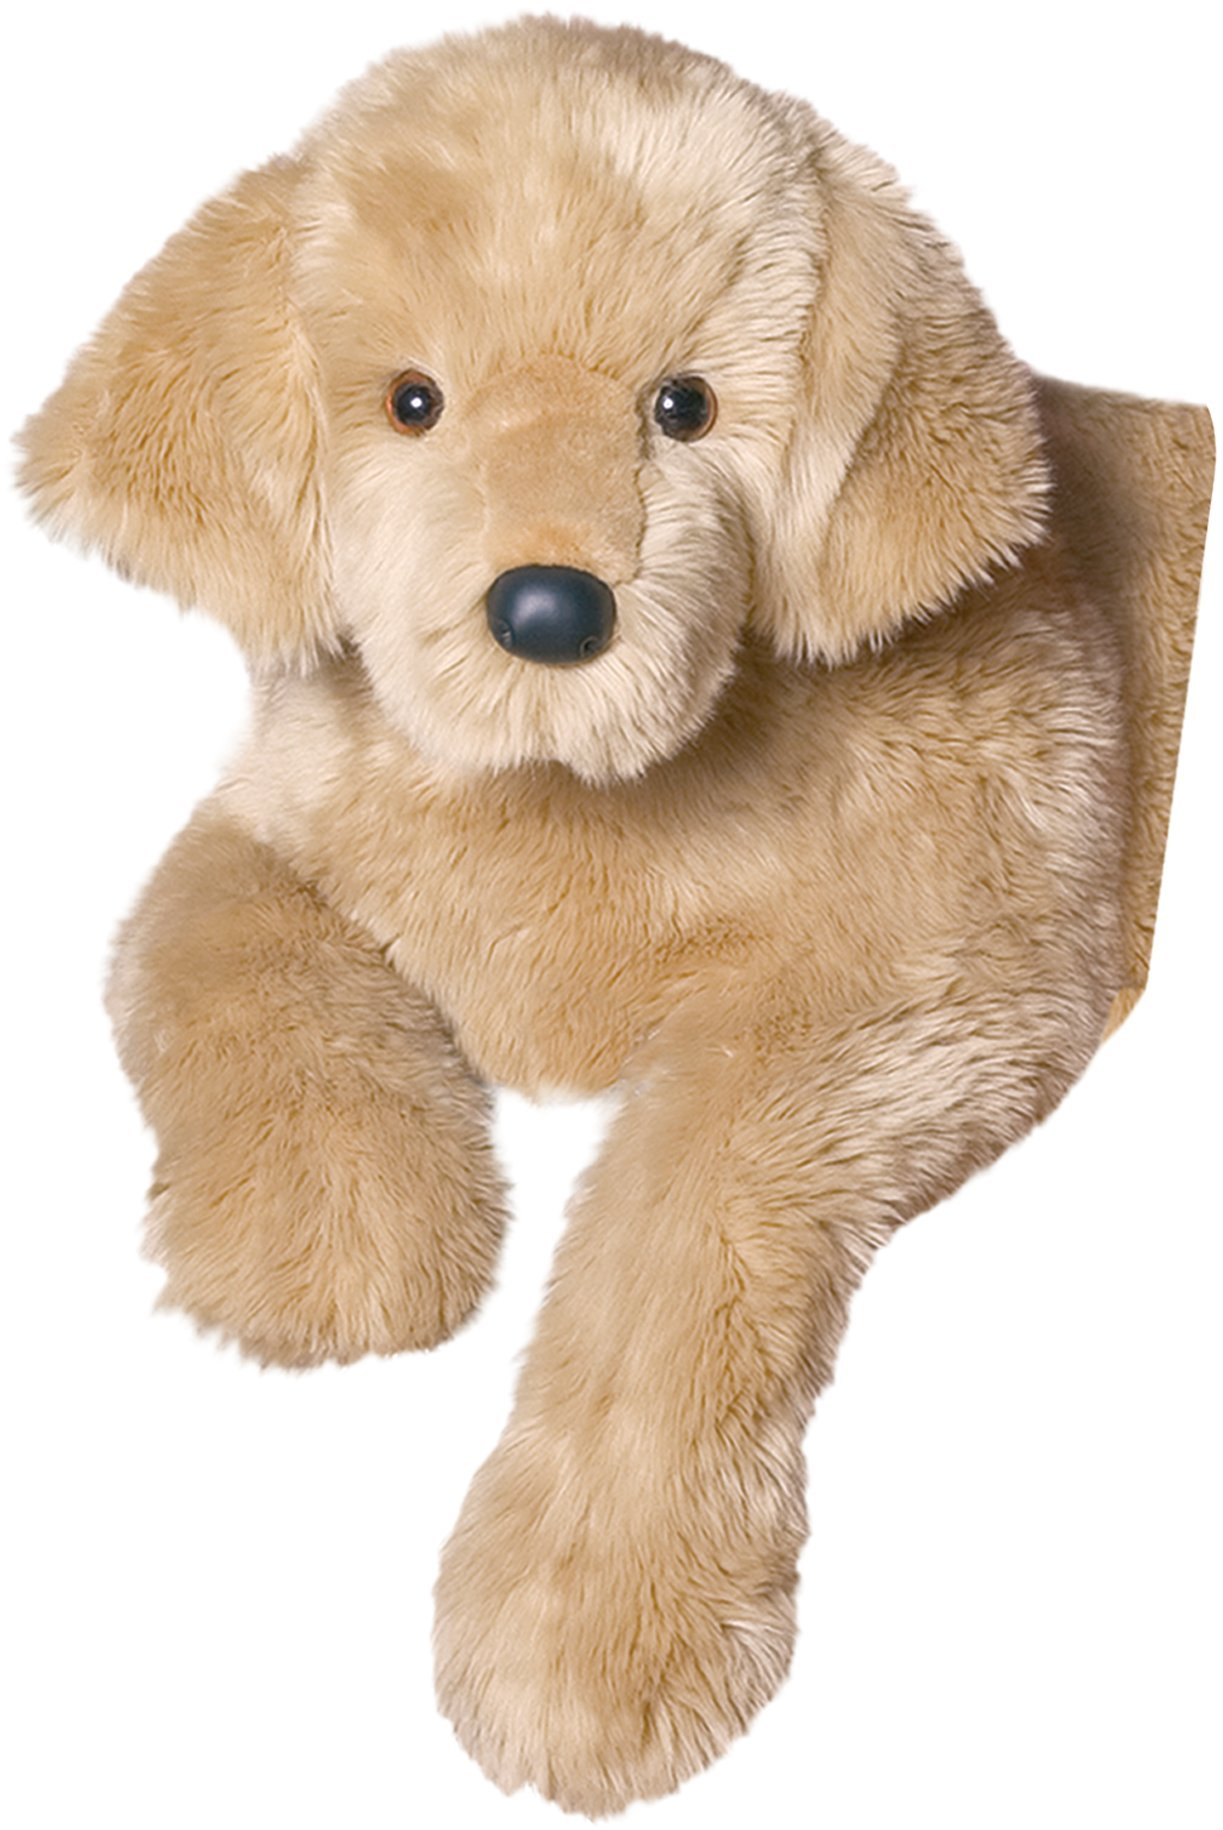 Cuddle Toys 2459 81 cm Long Sherman Golden Retriever Plush Toy by Cuddle Toys